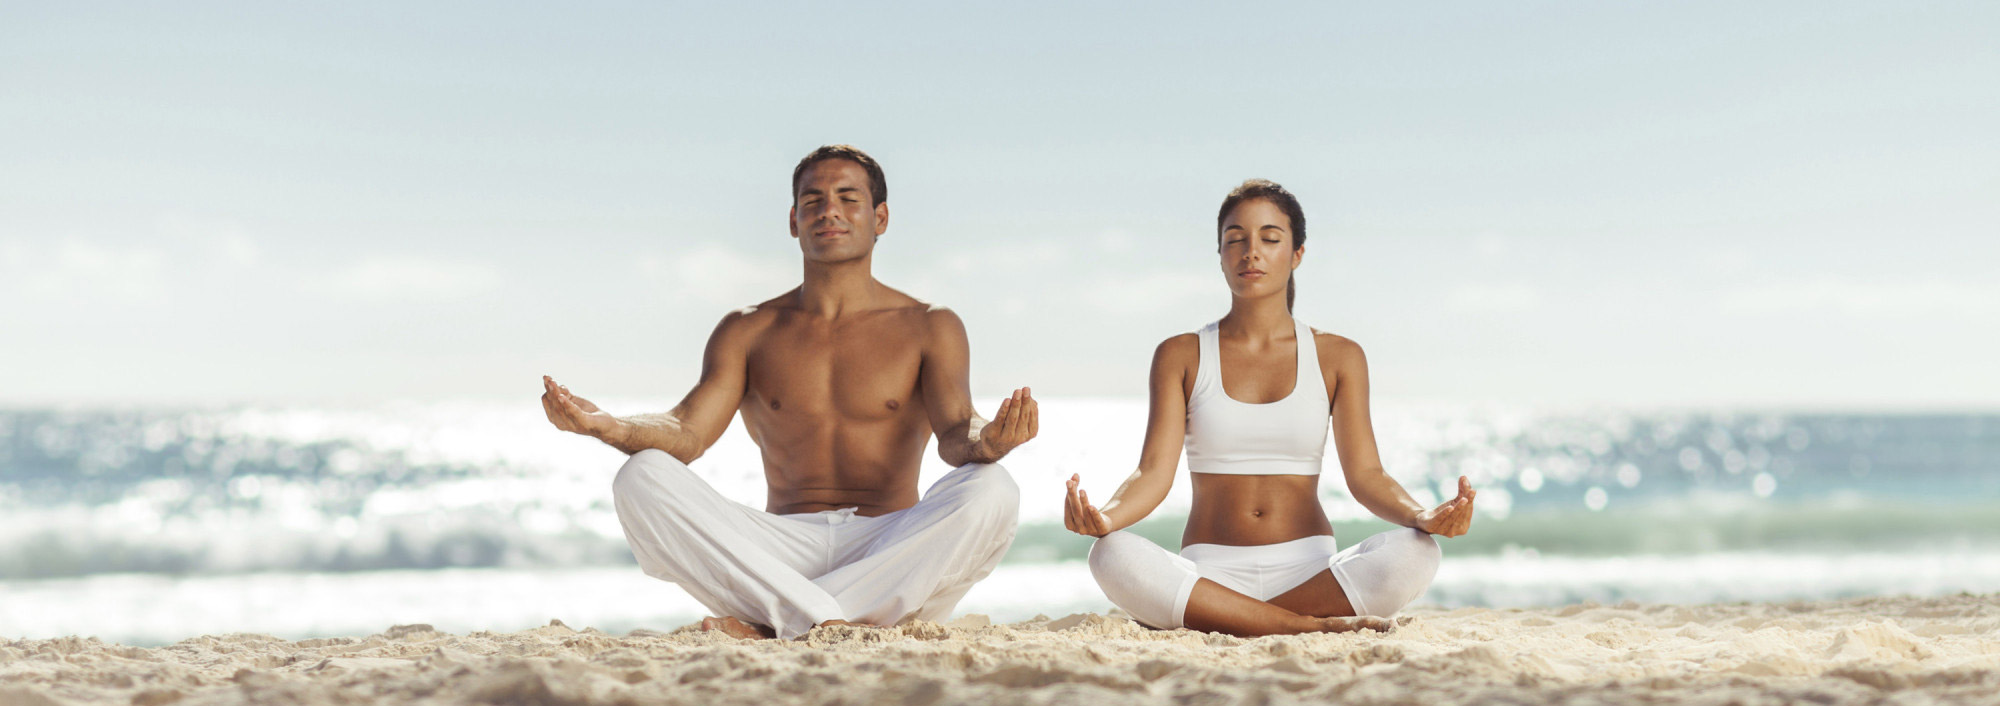 beach-yoga-spain